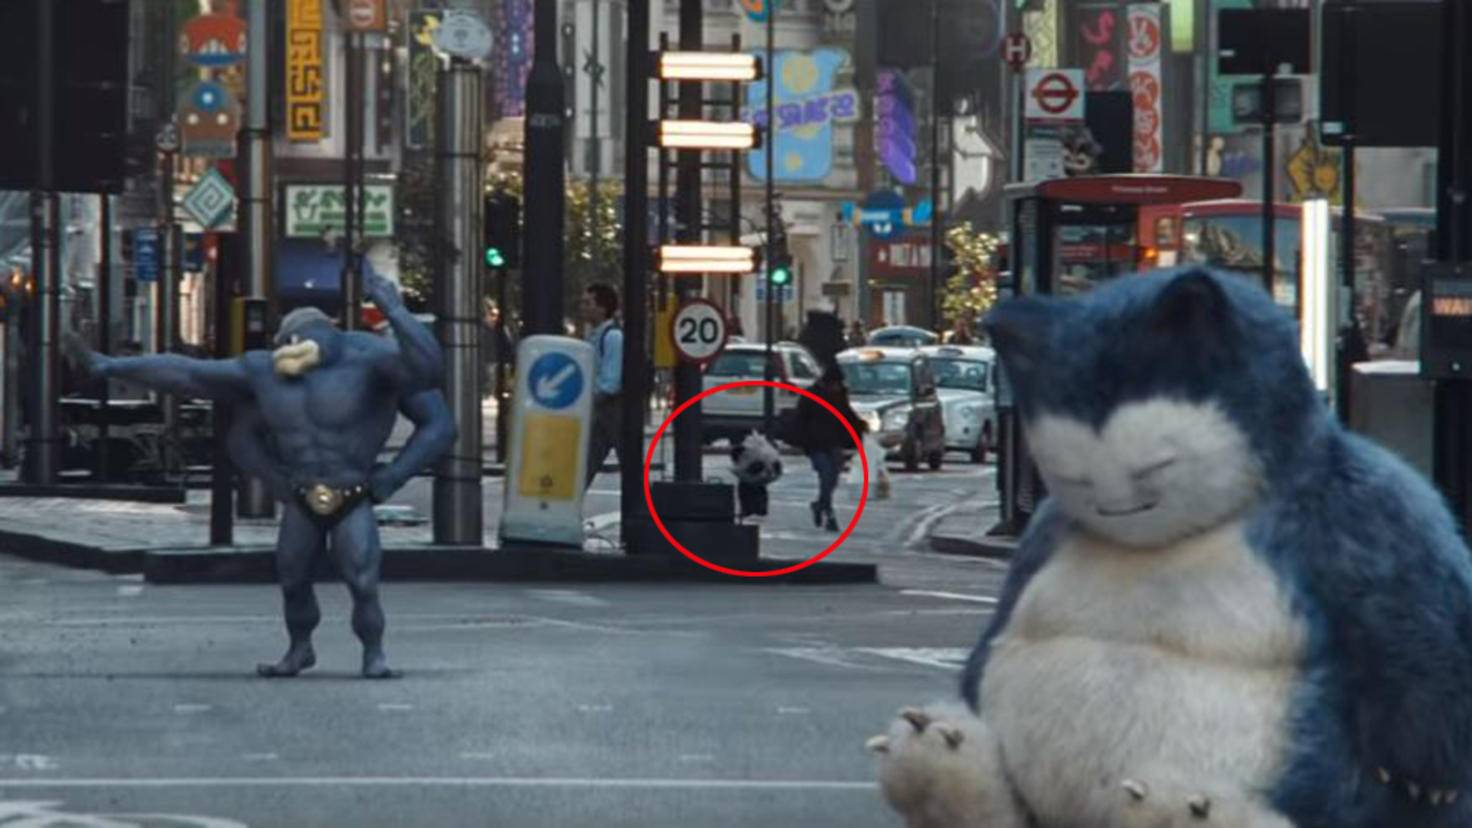 Pam-Pam in Meisterdetektiv Pikachu Trailer 2